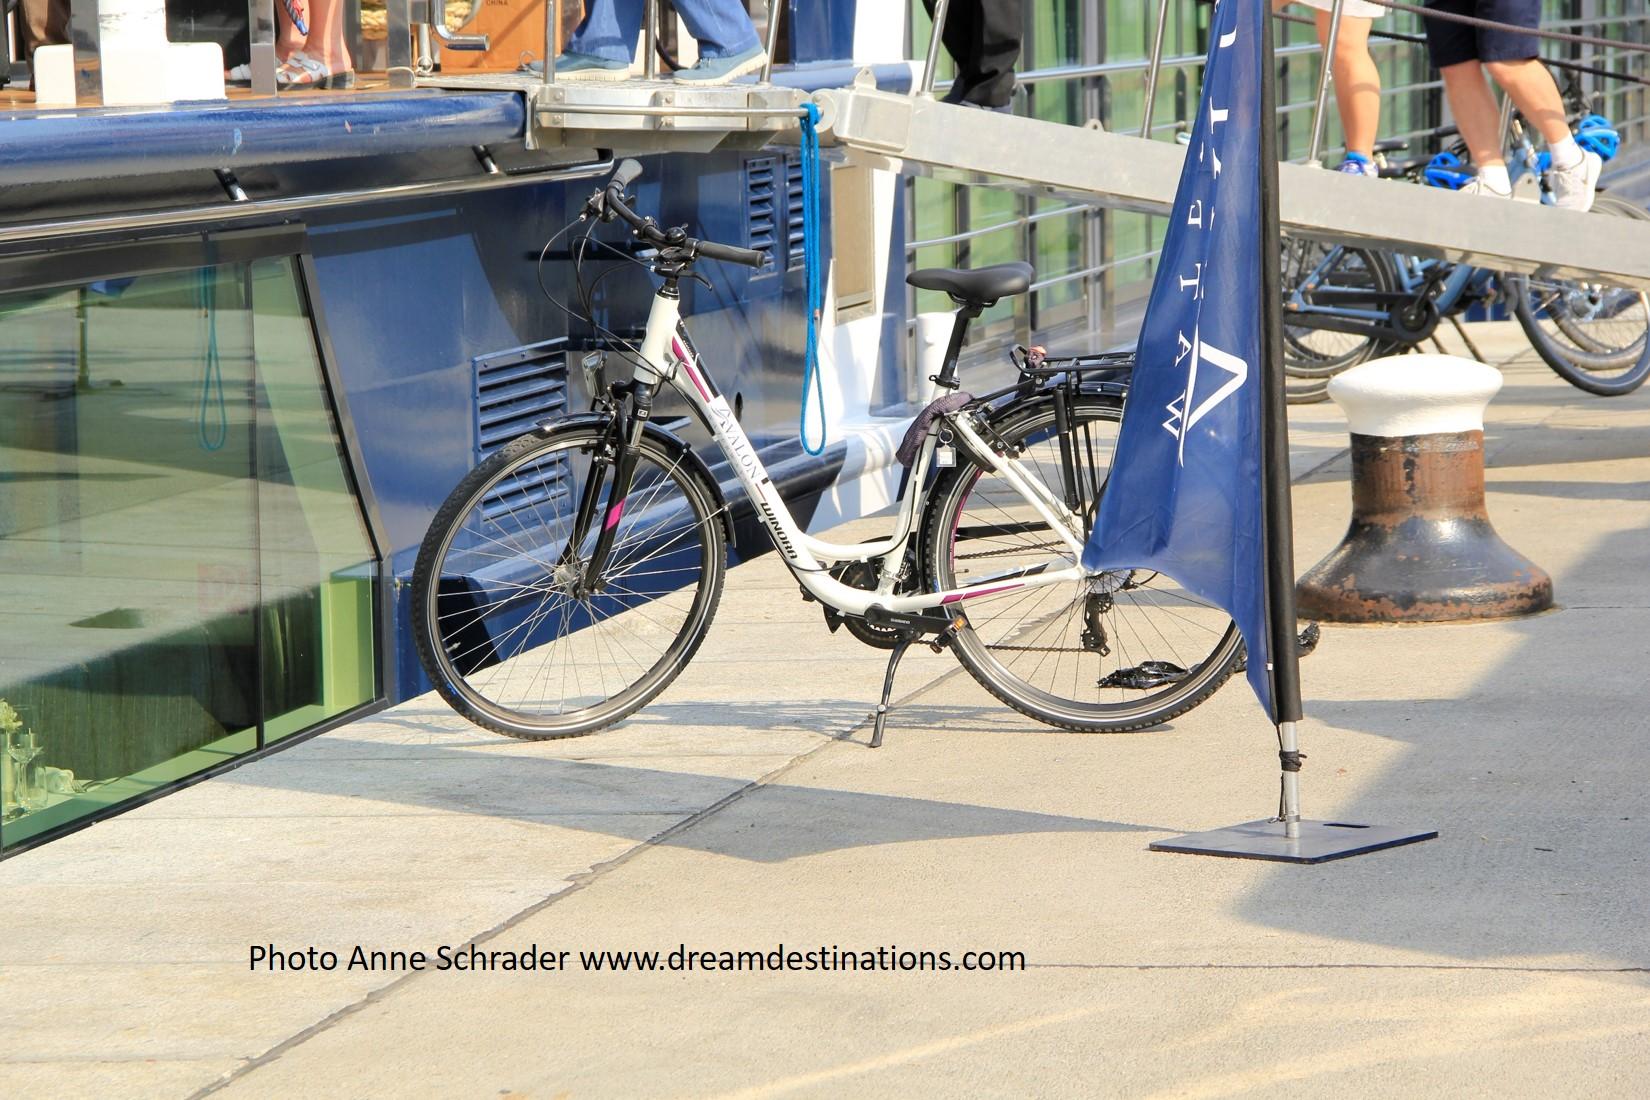 Avalon Bikes ready for use.